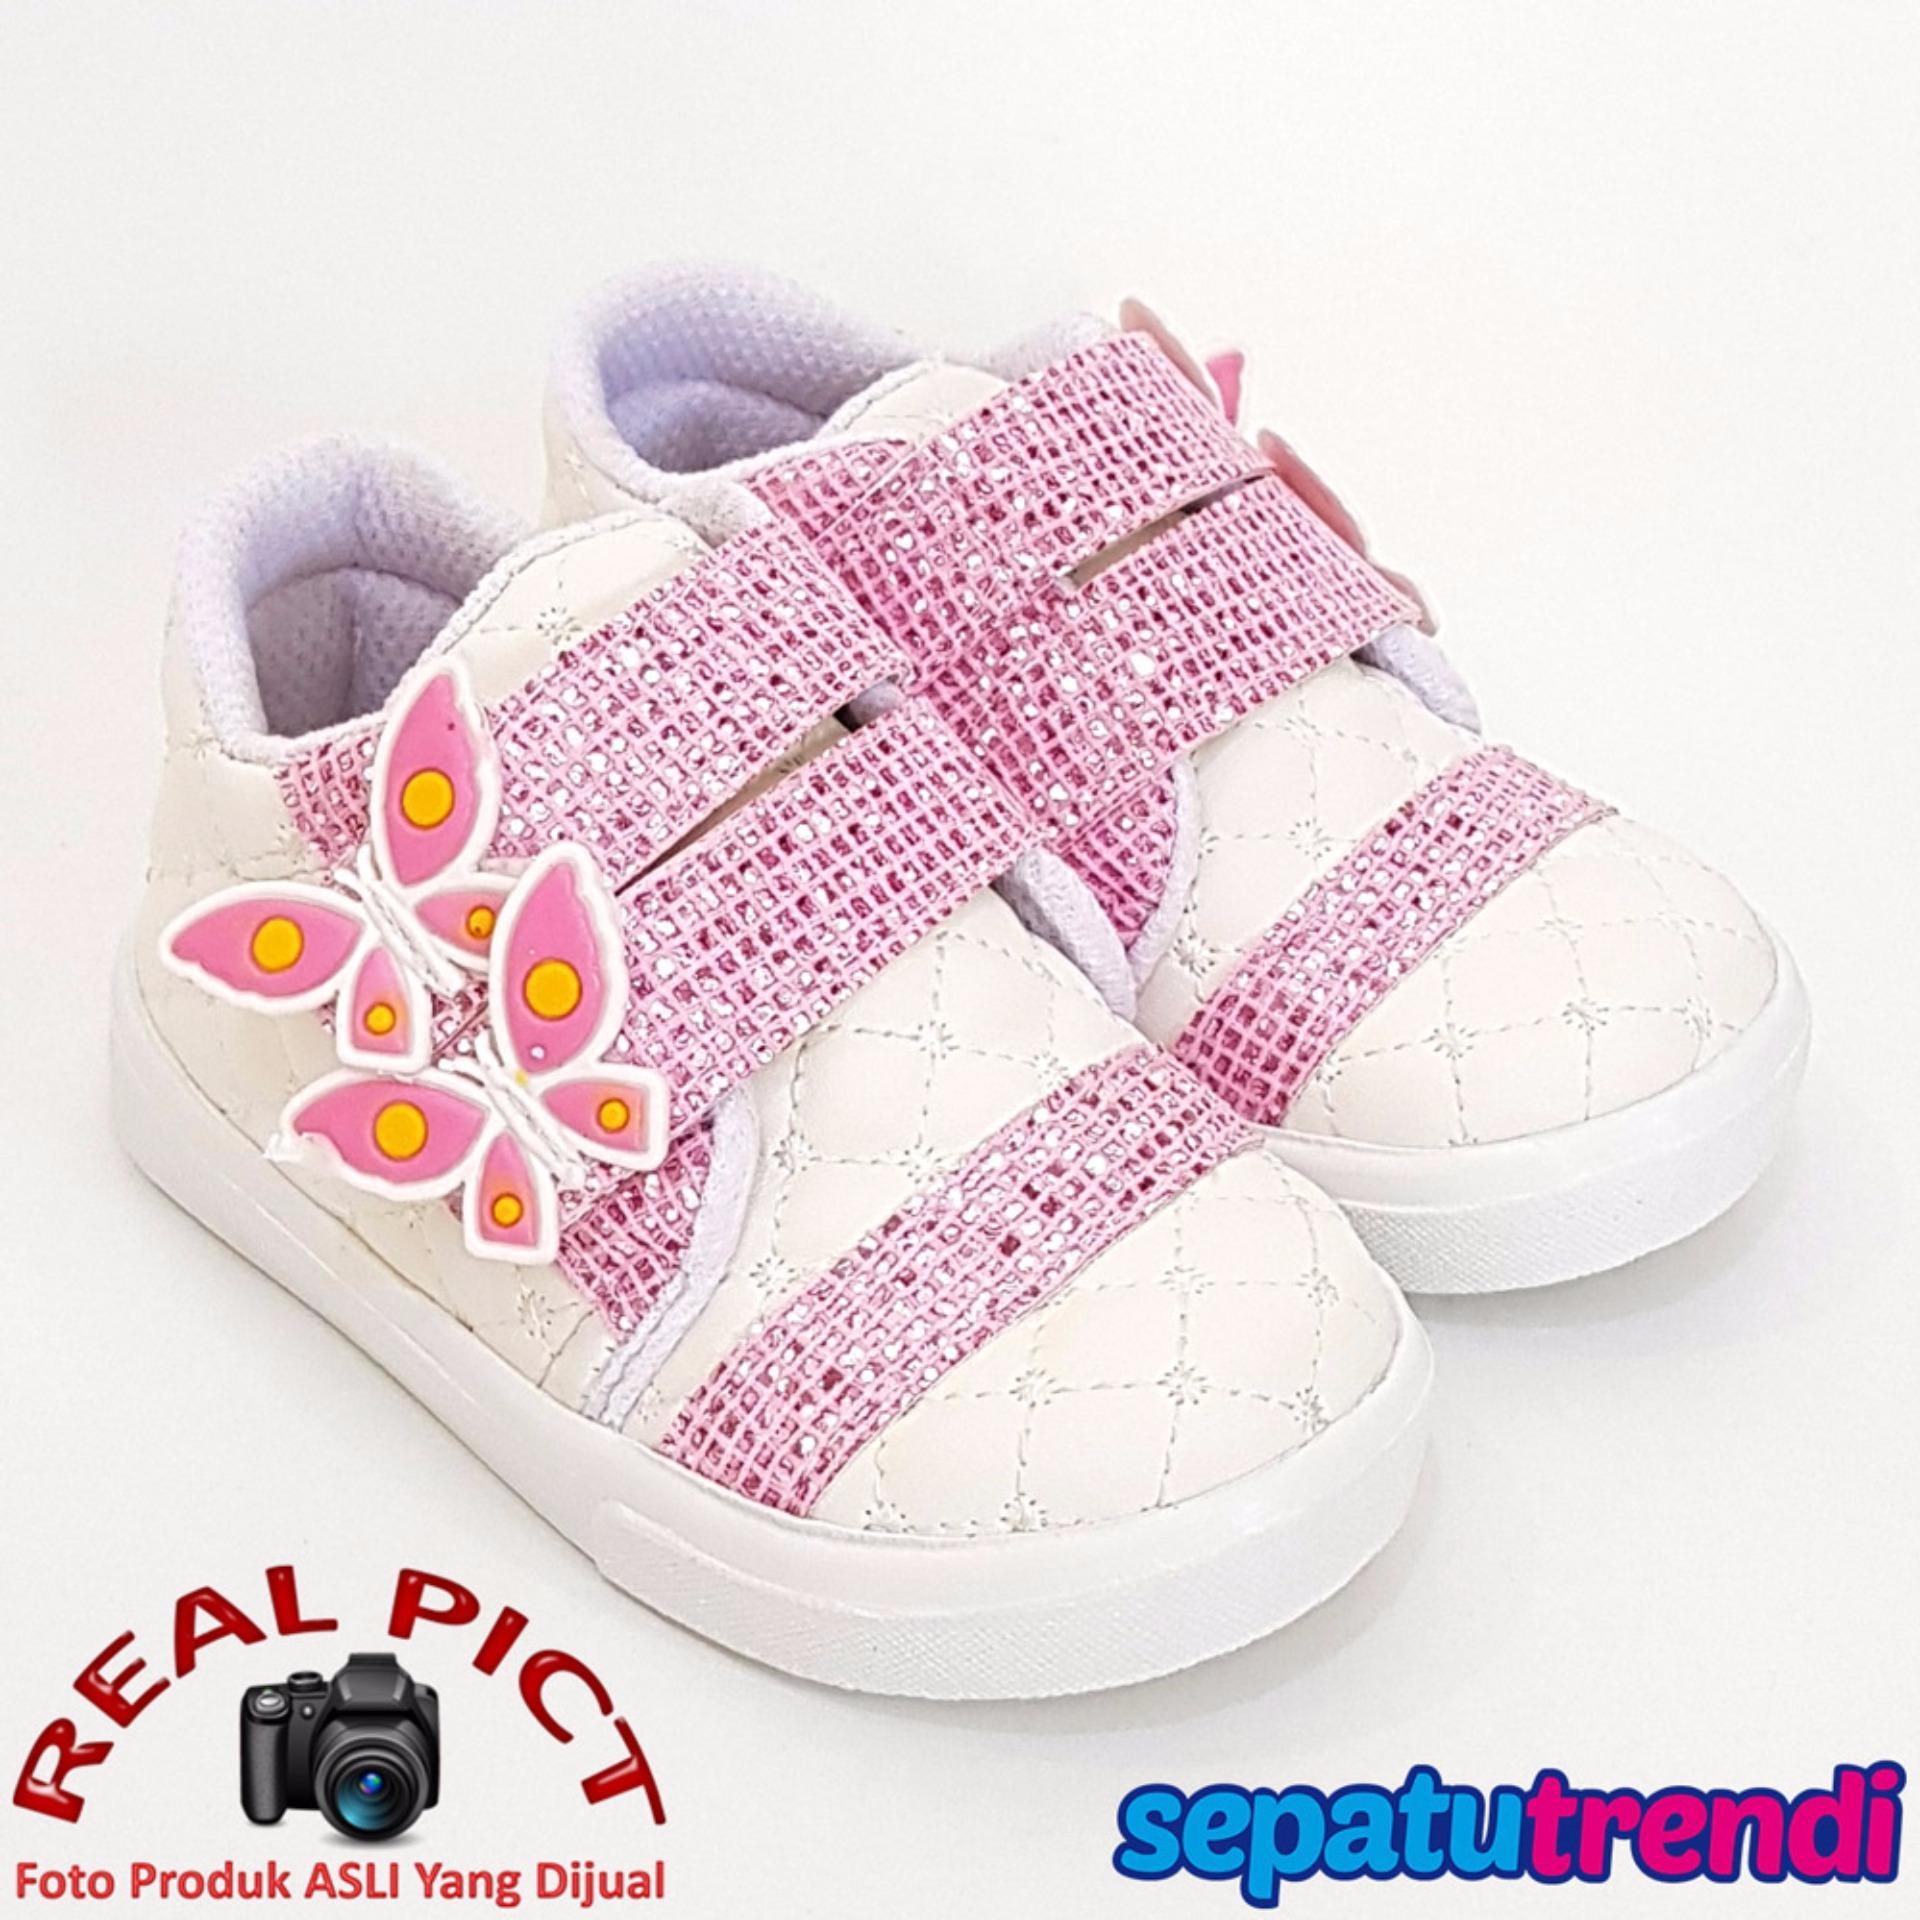 Harga Trendishoes Sepatu Anak Perempuan Kpwj Putih Pink Trendishoes Online